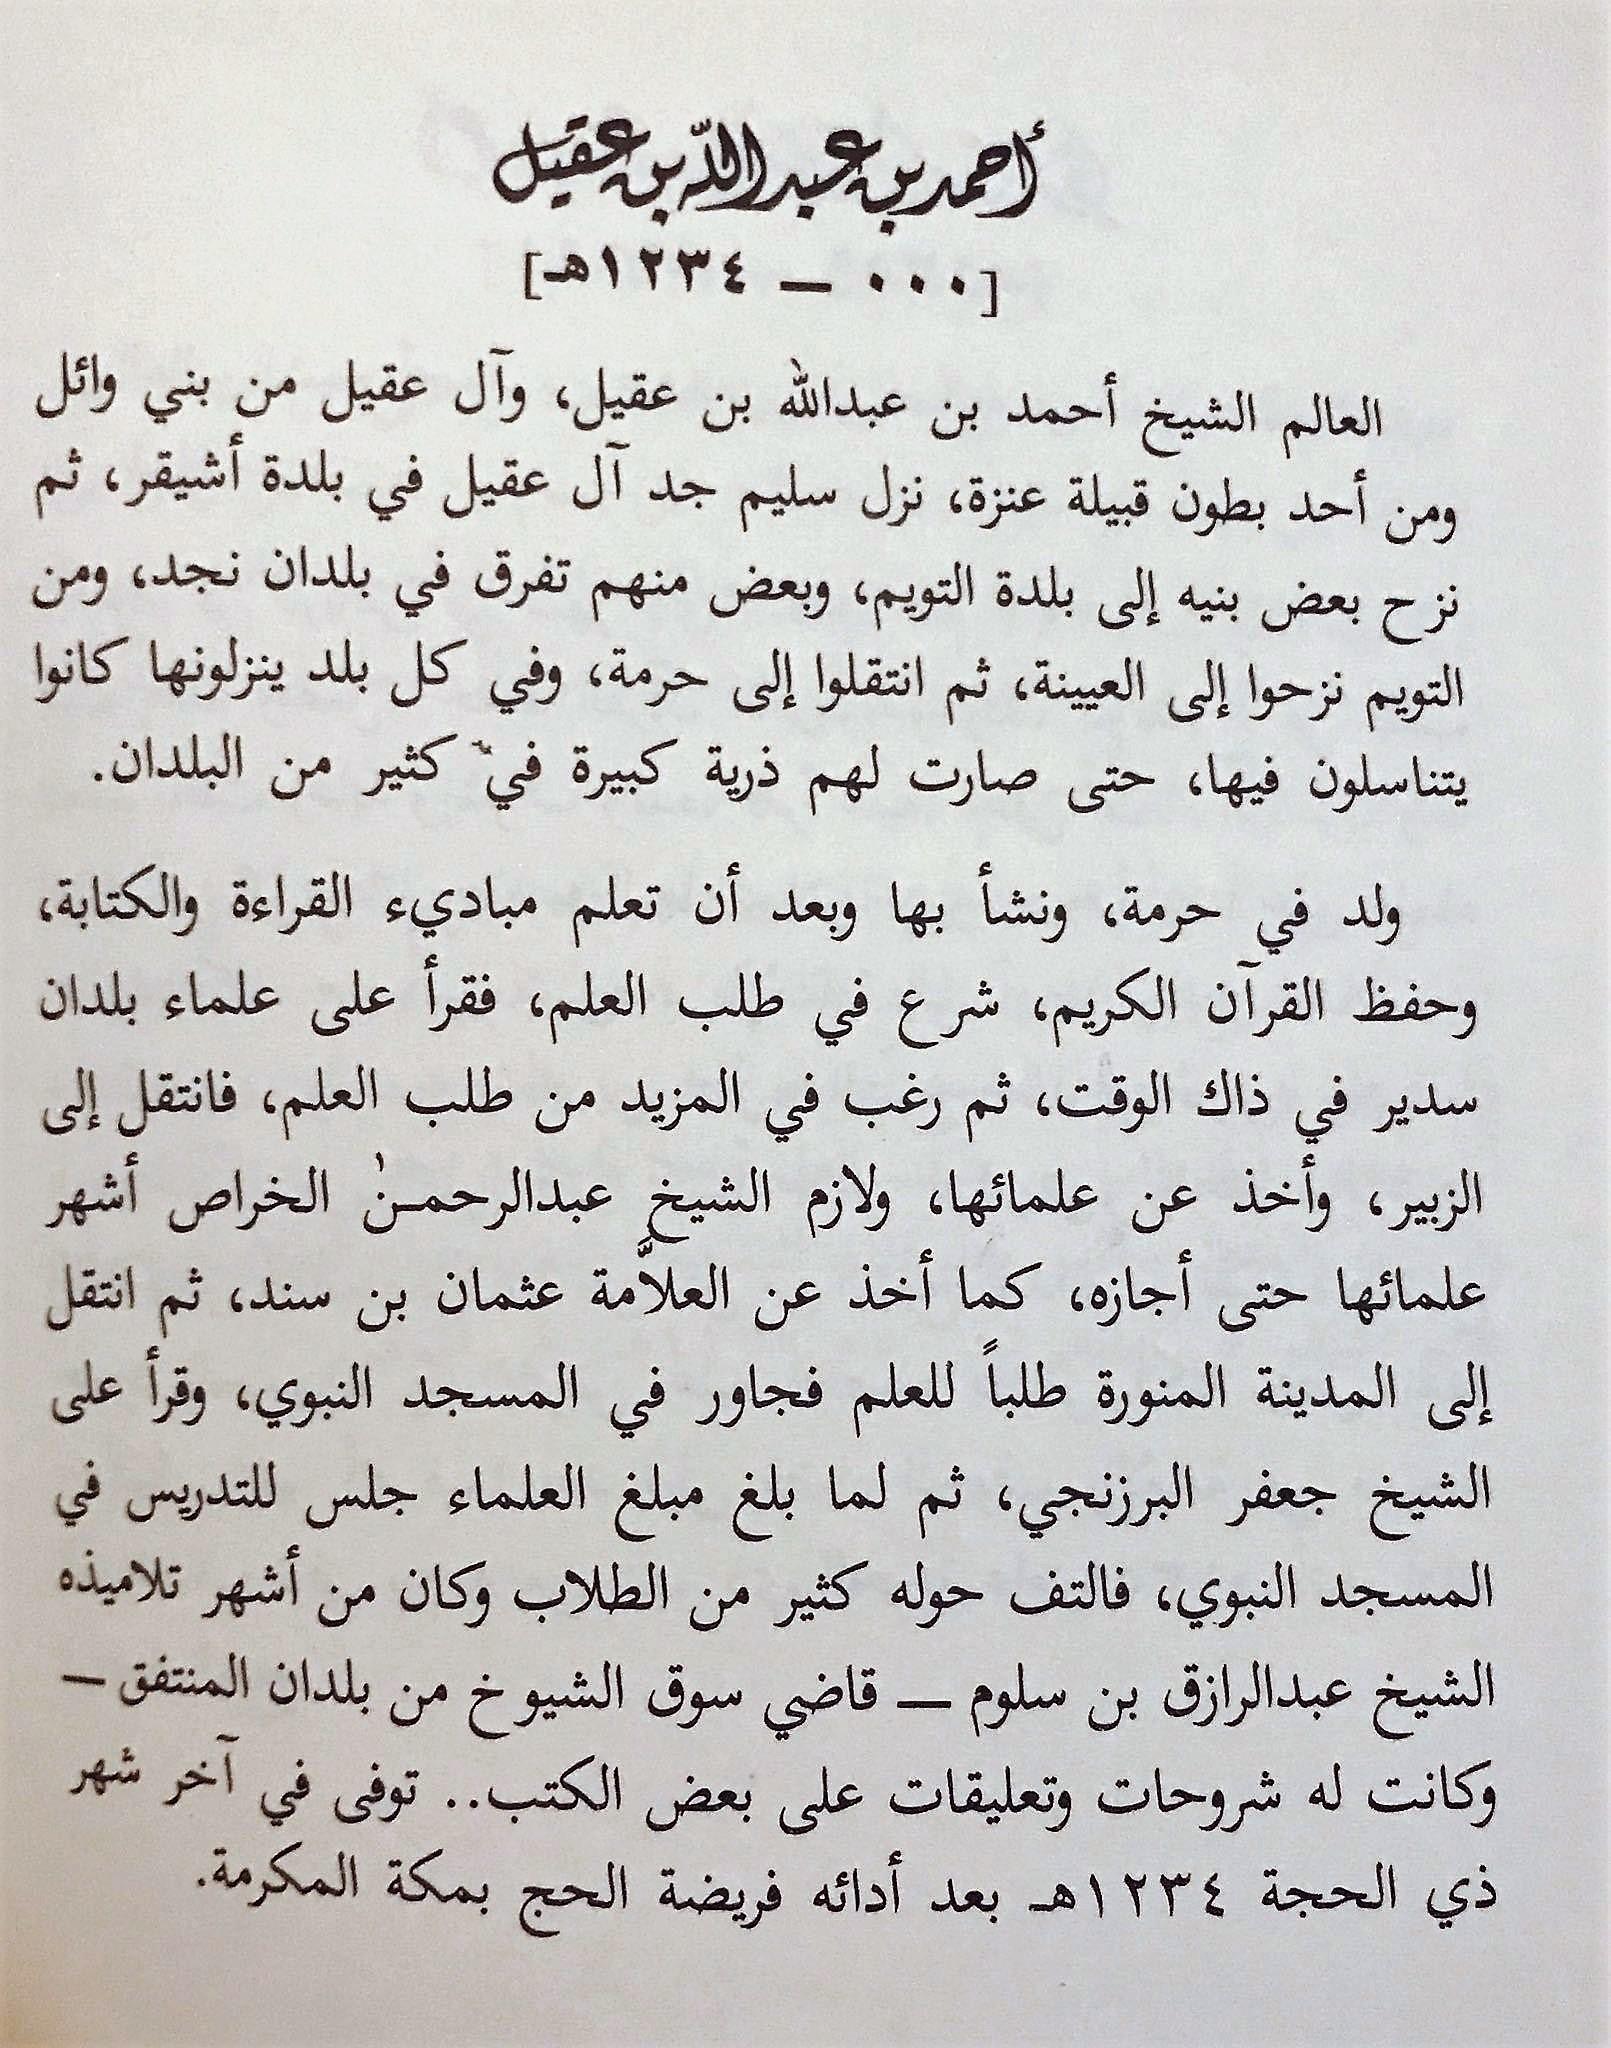 أحمد بن عبدالله بن عقيل